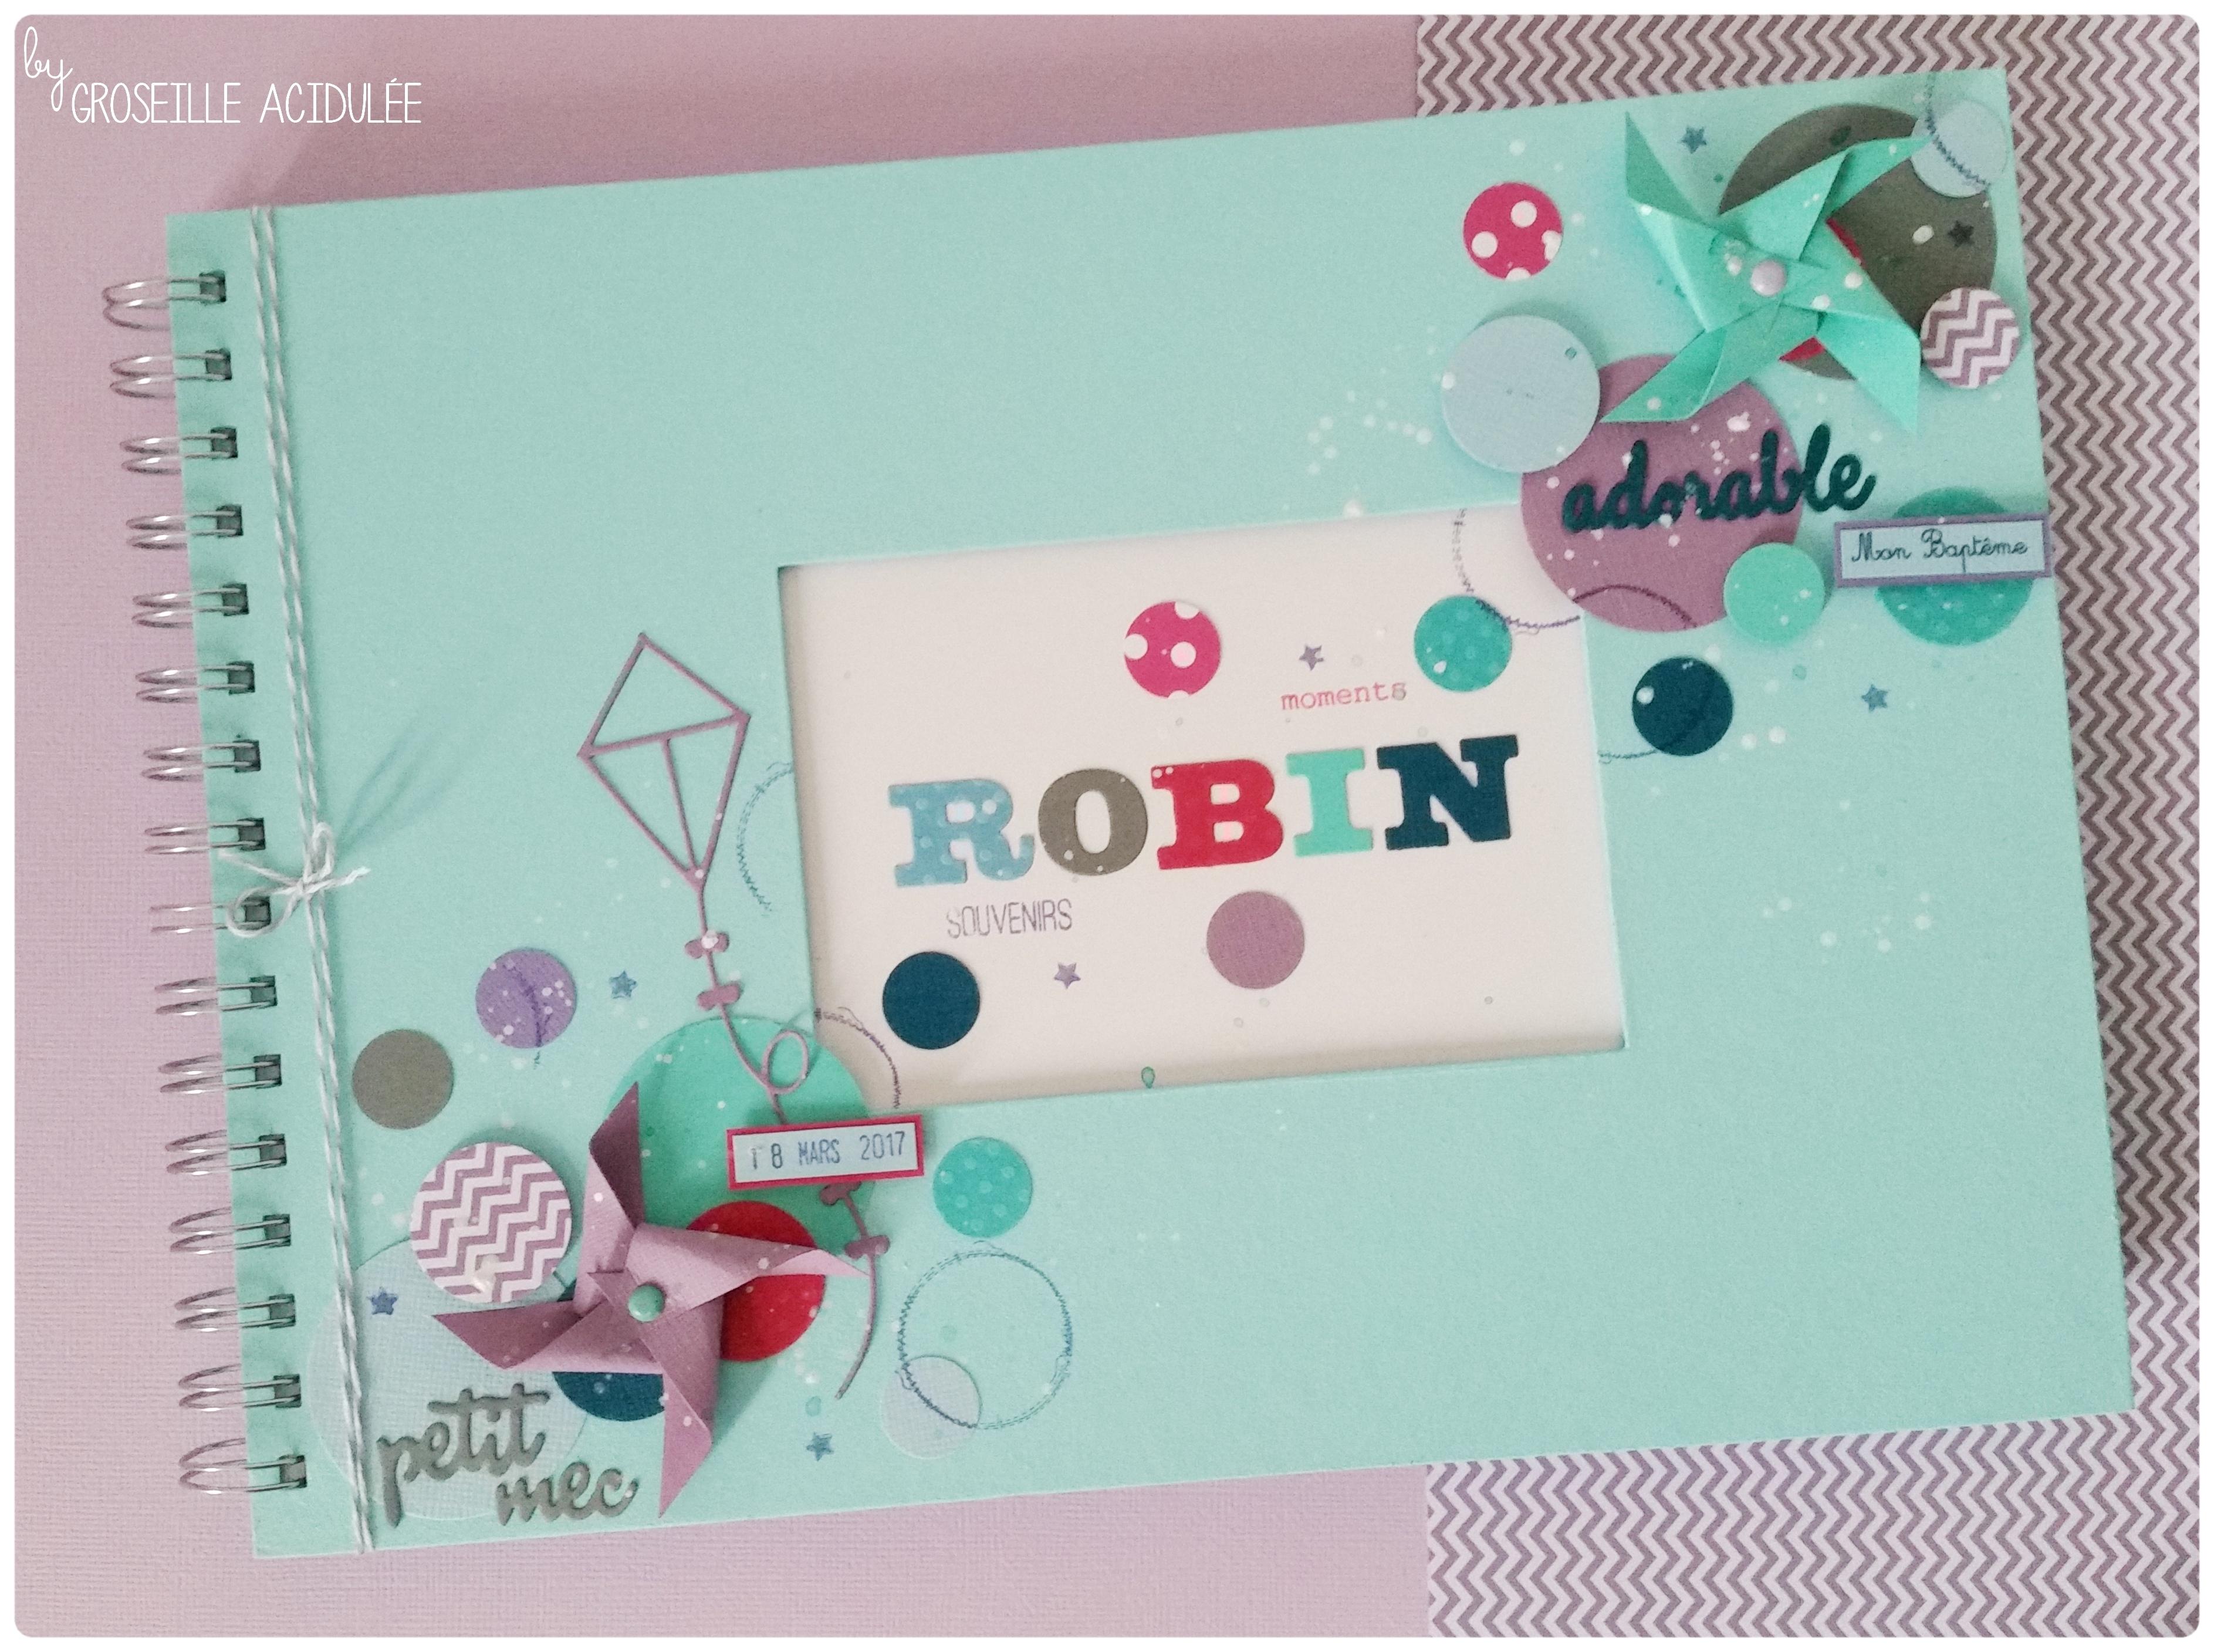 Livre d'or – Baptême de Robin